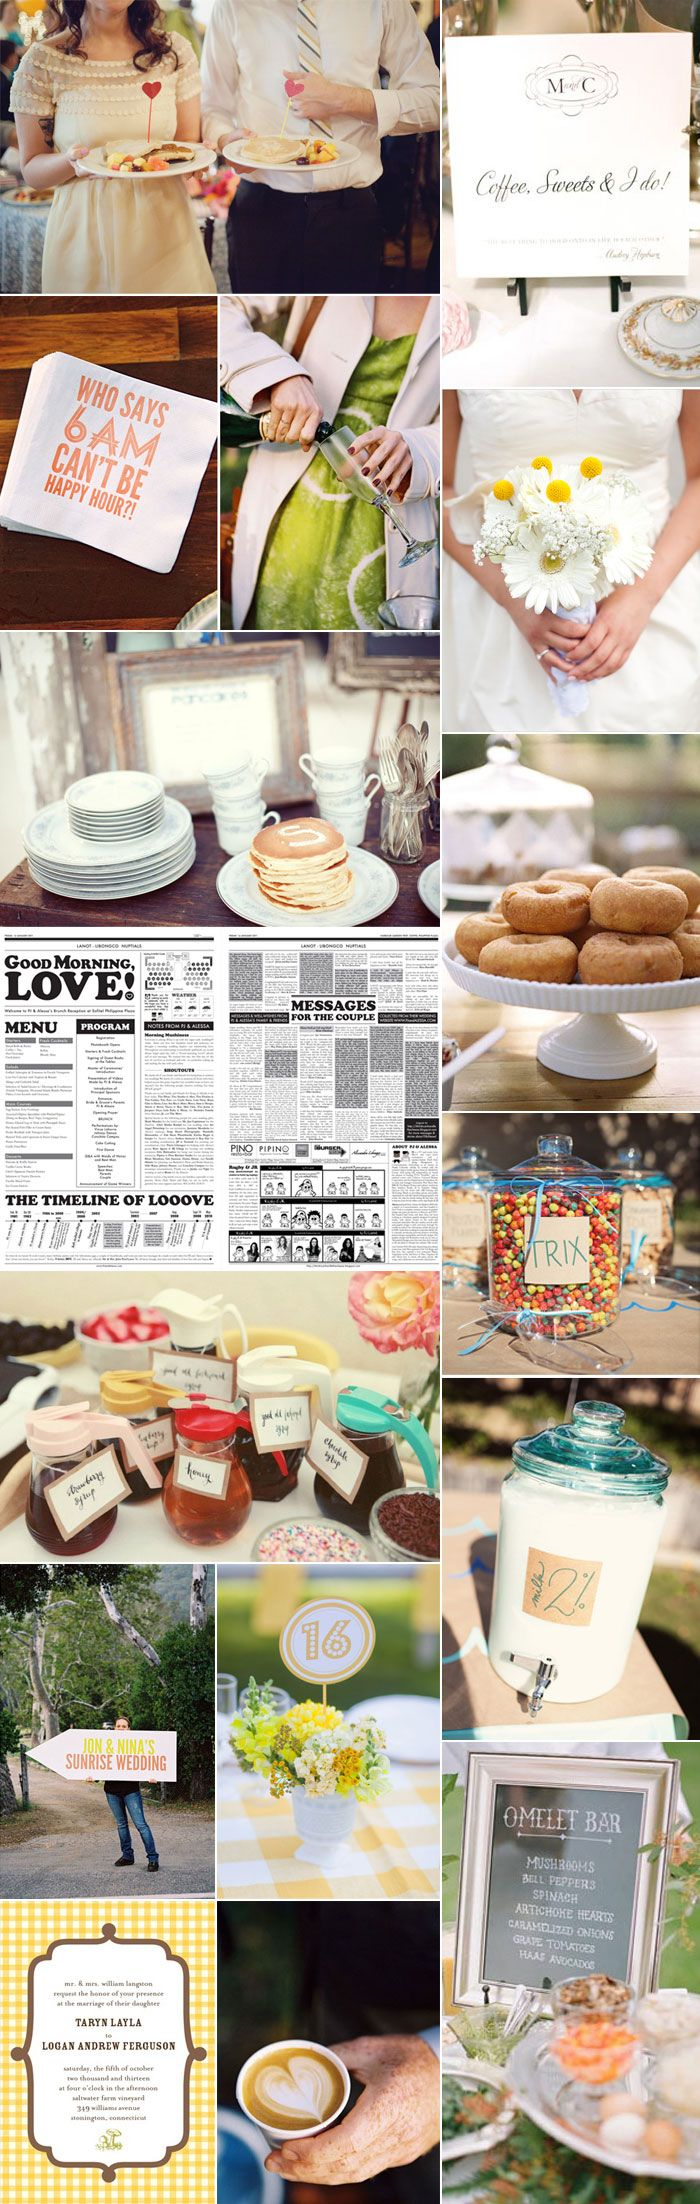 SUPER cute idea! Breakfast or Brunch Wedding for an early morning wedding